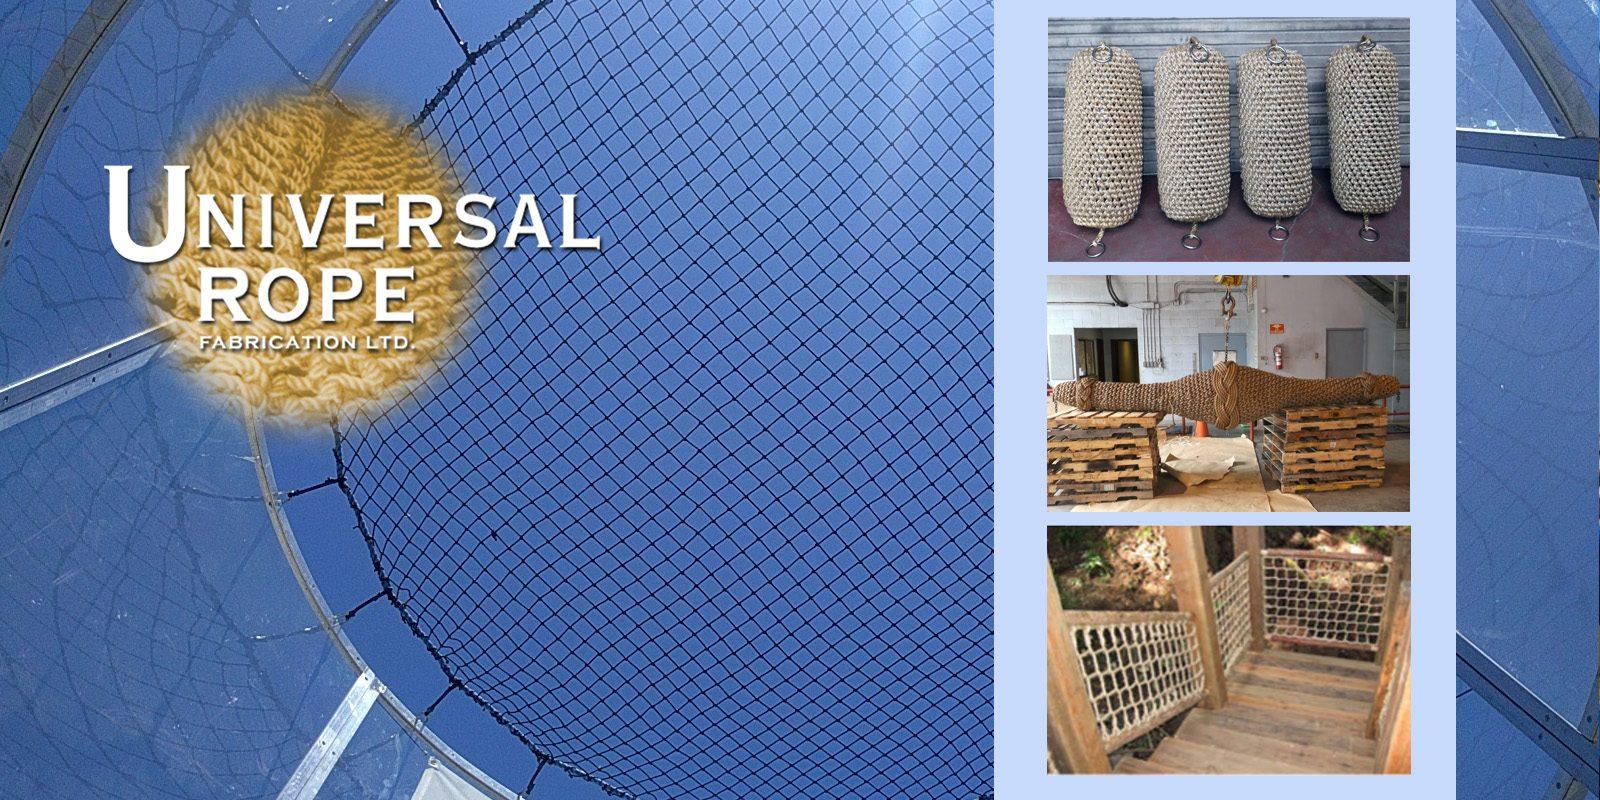 Universal Rope Fabrication Ltd.